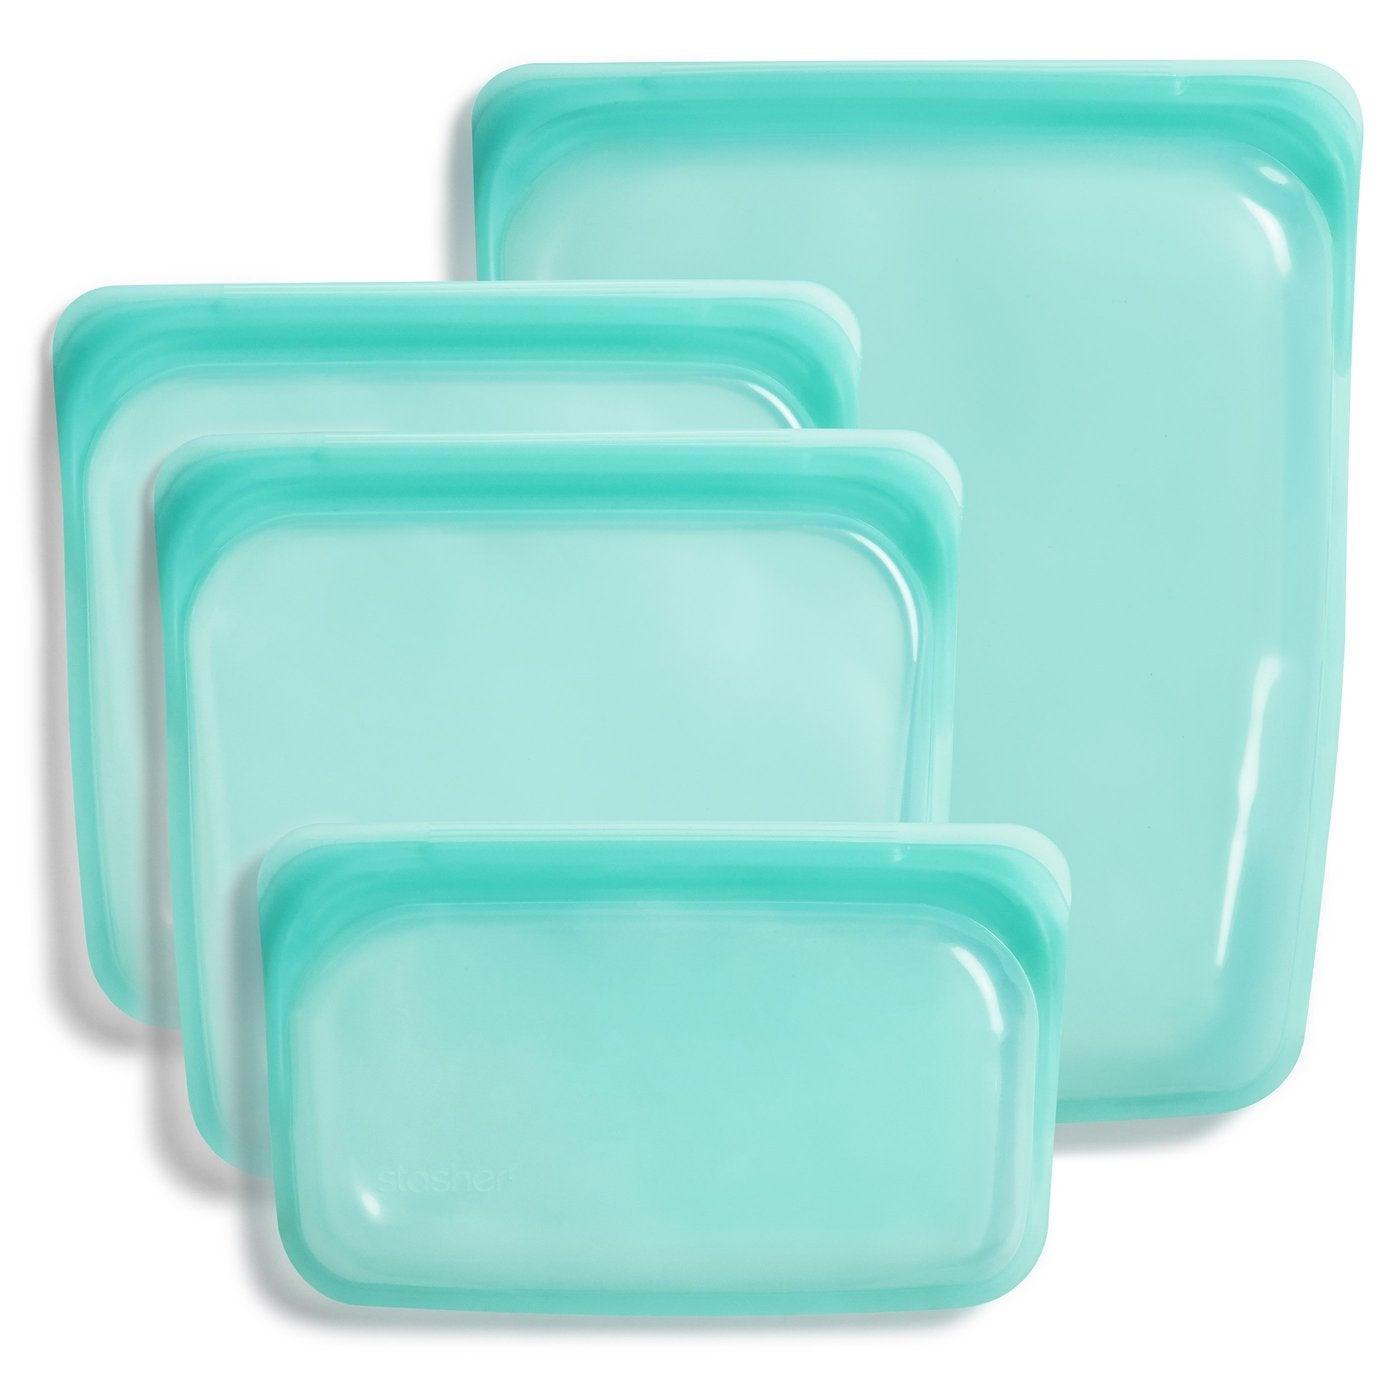 Aqua reausable Stasher bags